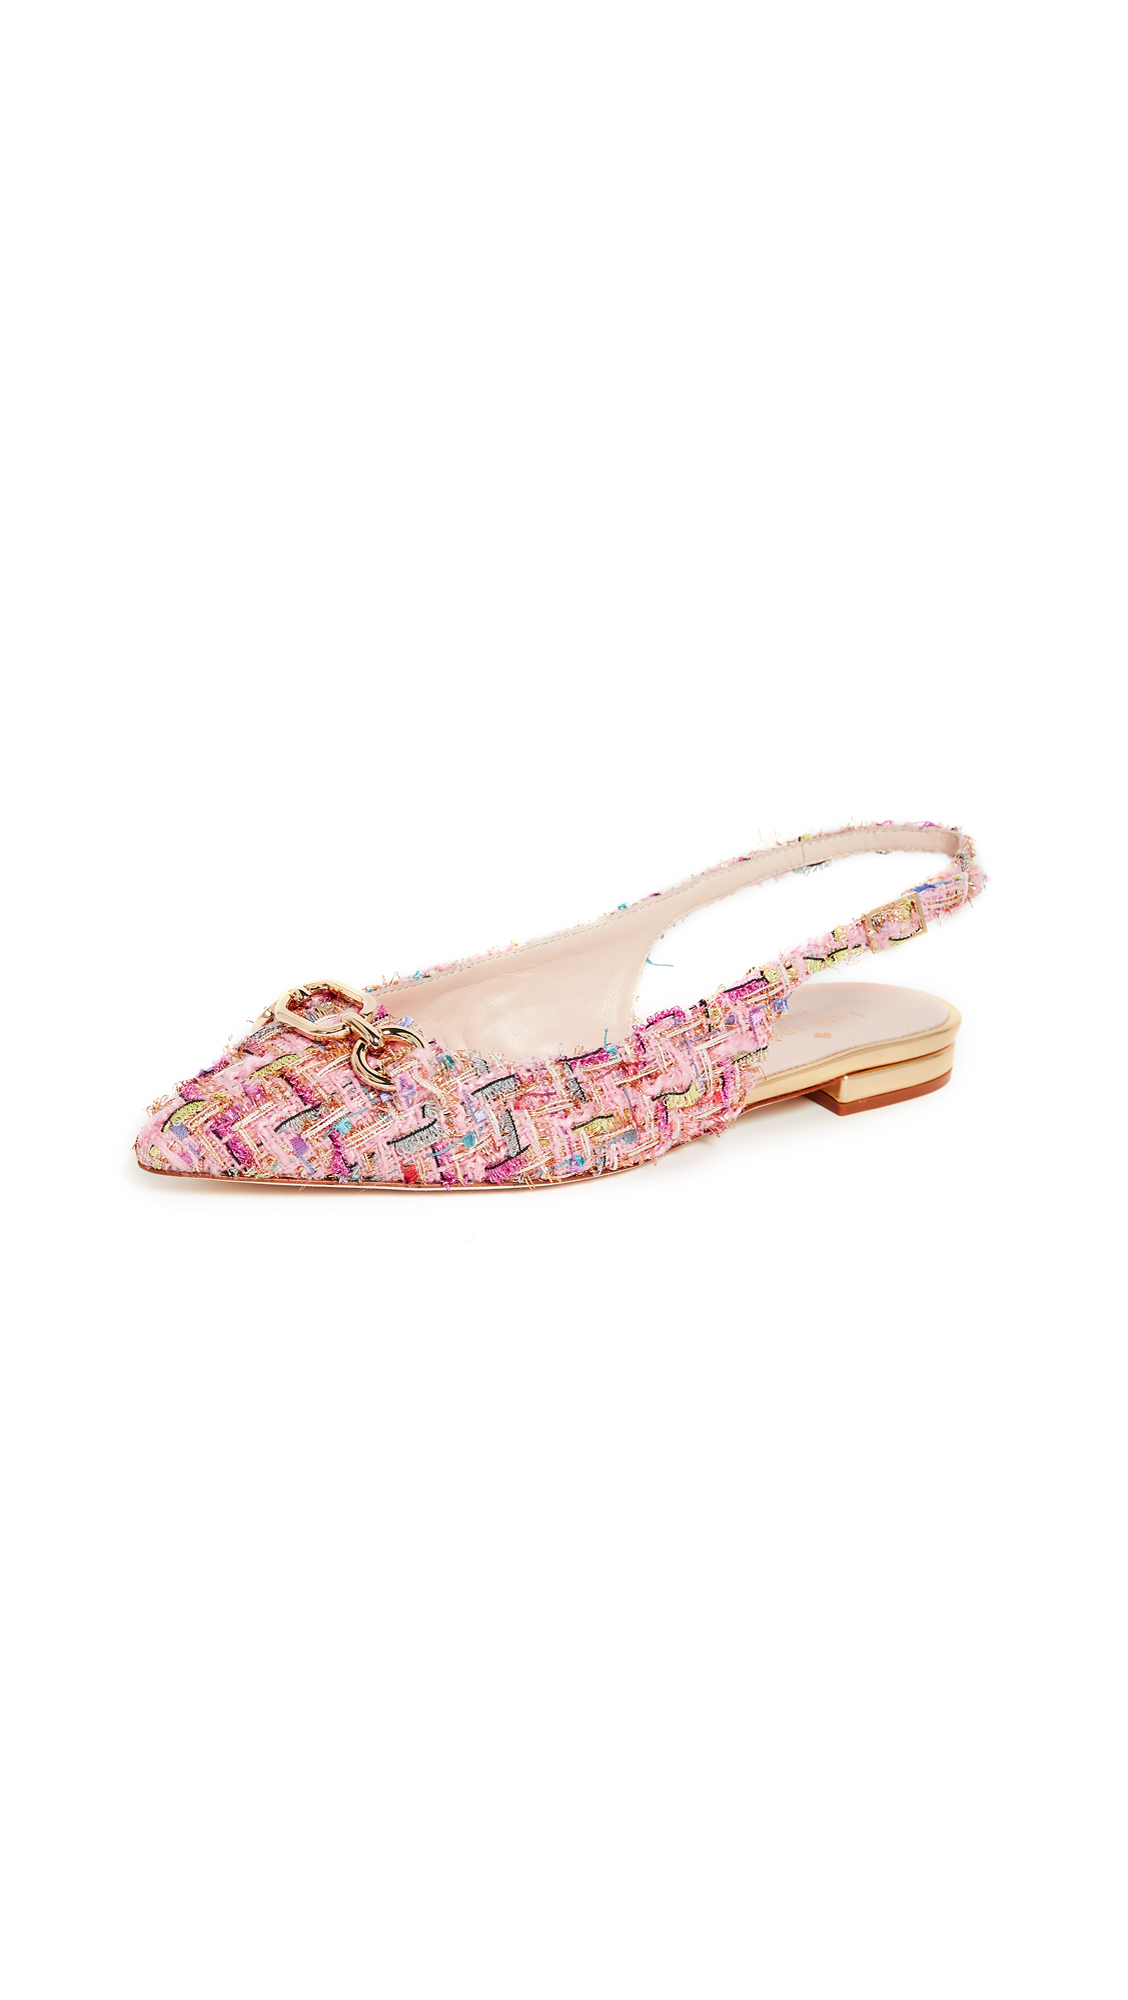 Kate Spade New York Belle Slingback Skimmers - Pink Multi